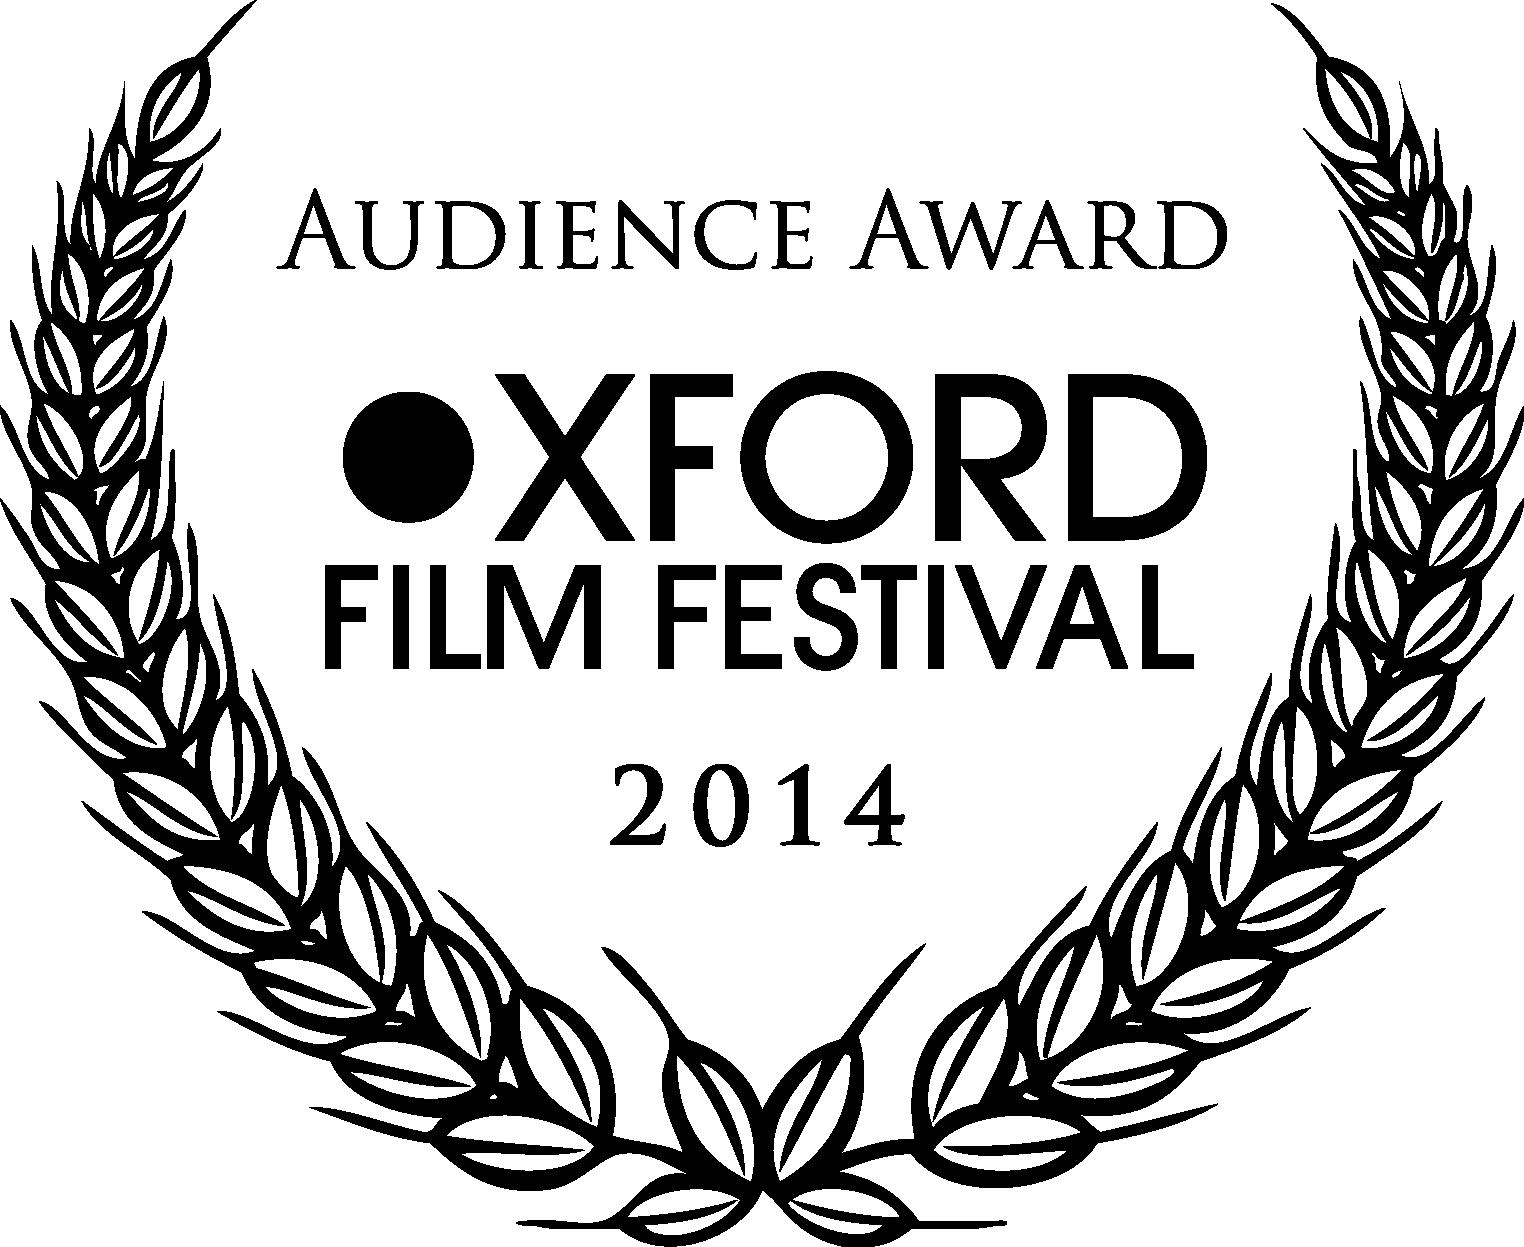 14OFF_audience_award_logo.png